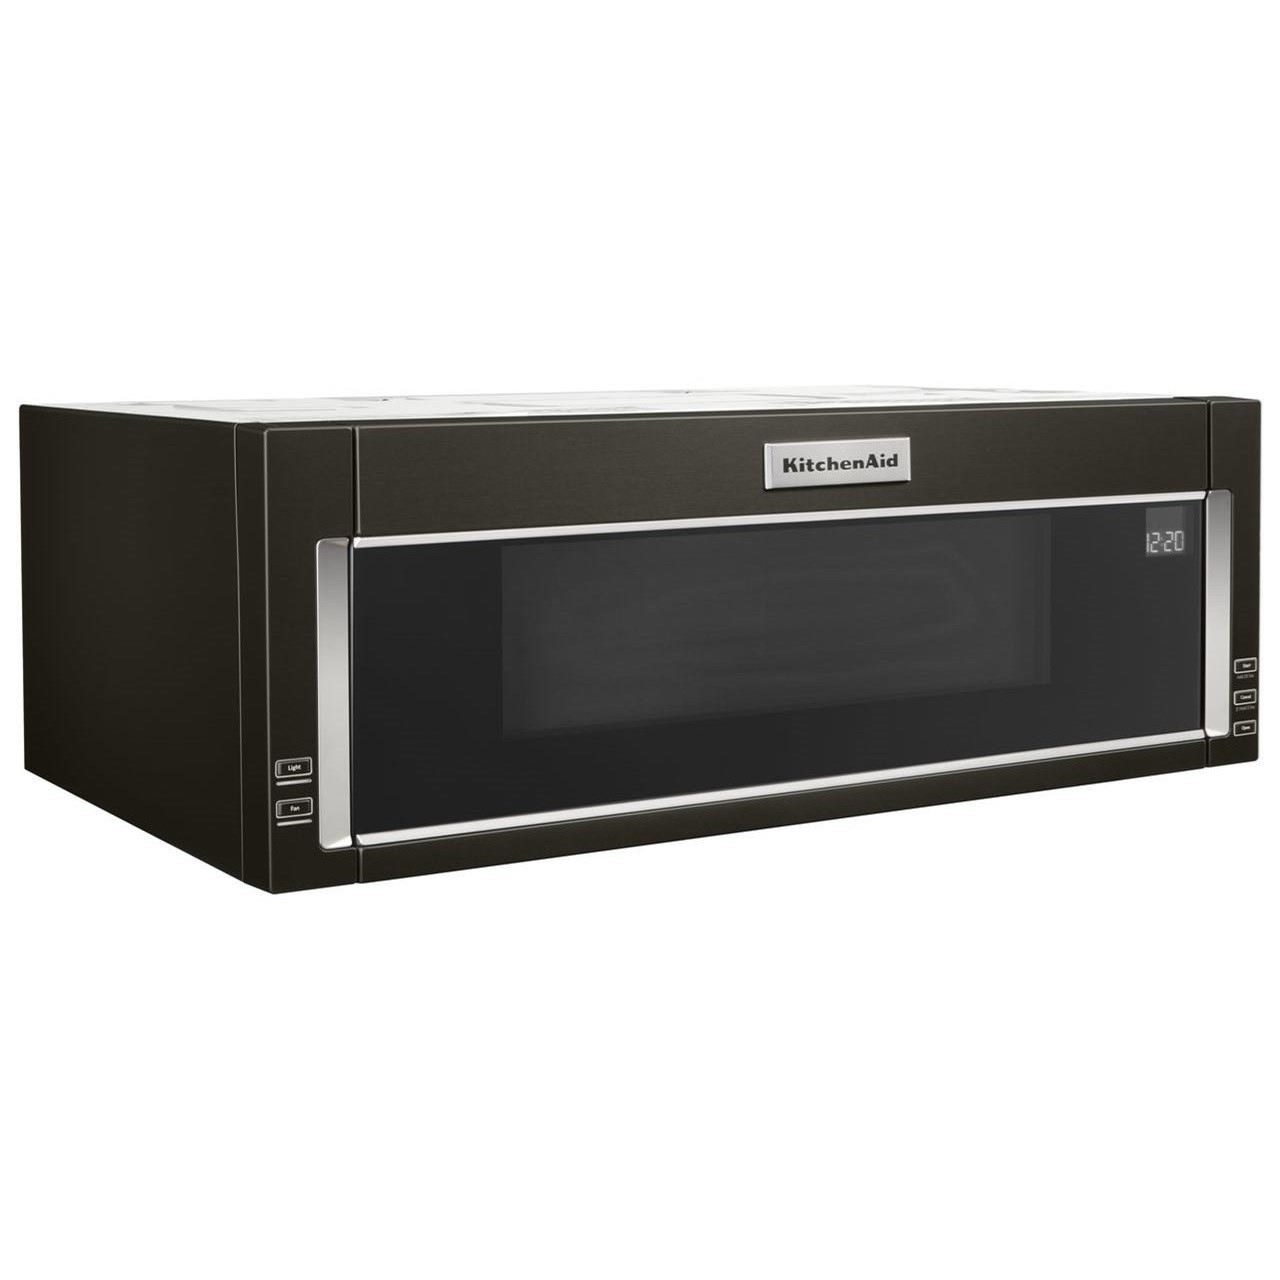 kitchenaid kmls311hbs 1000-watt low profile microwave hood